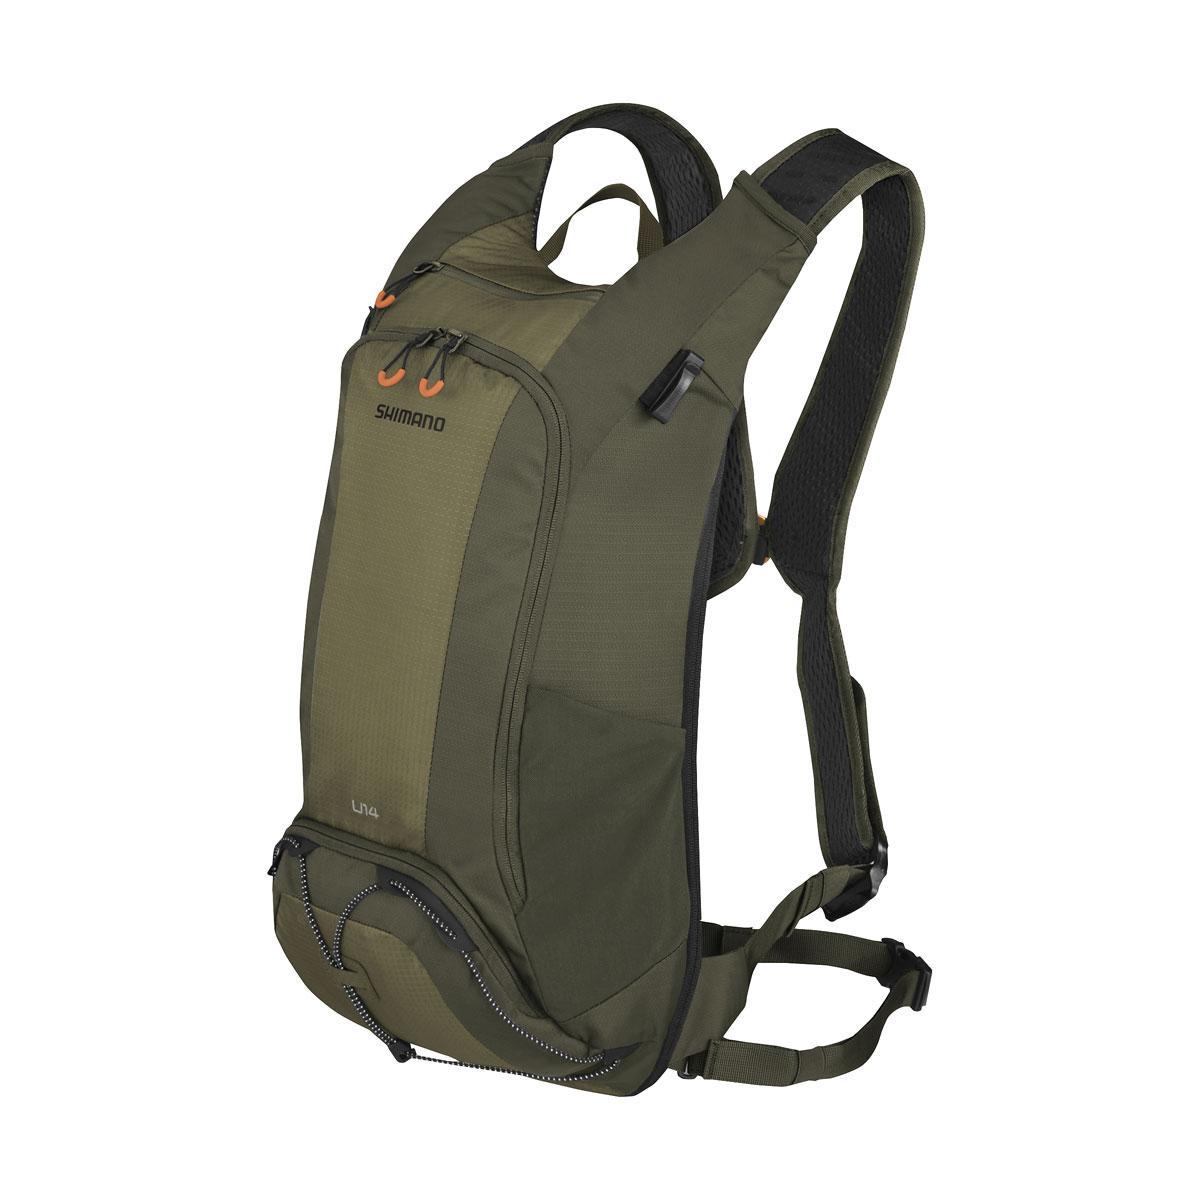 Рюкзак SHIMANO UNZEN 14L, оливковий